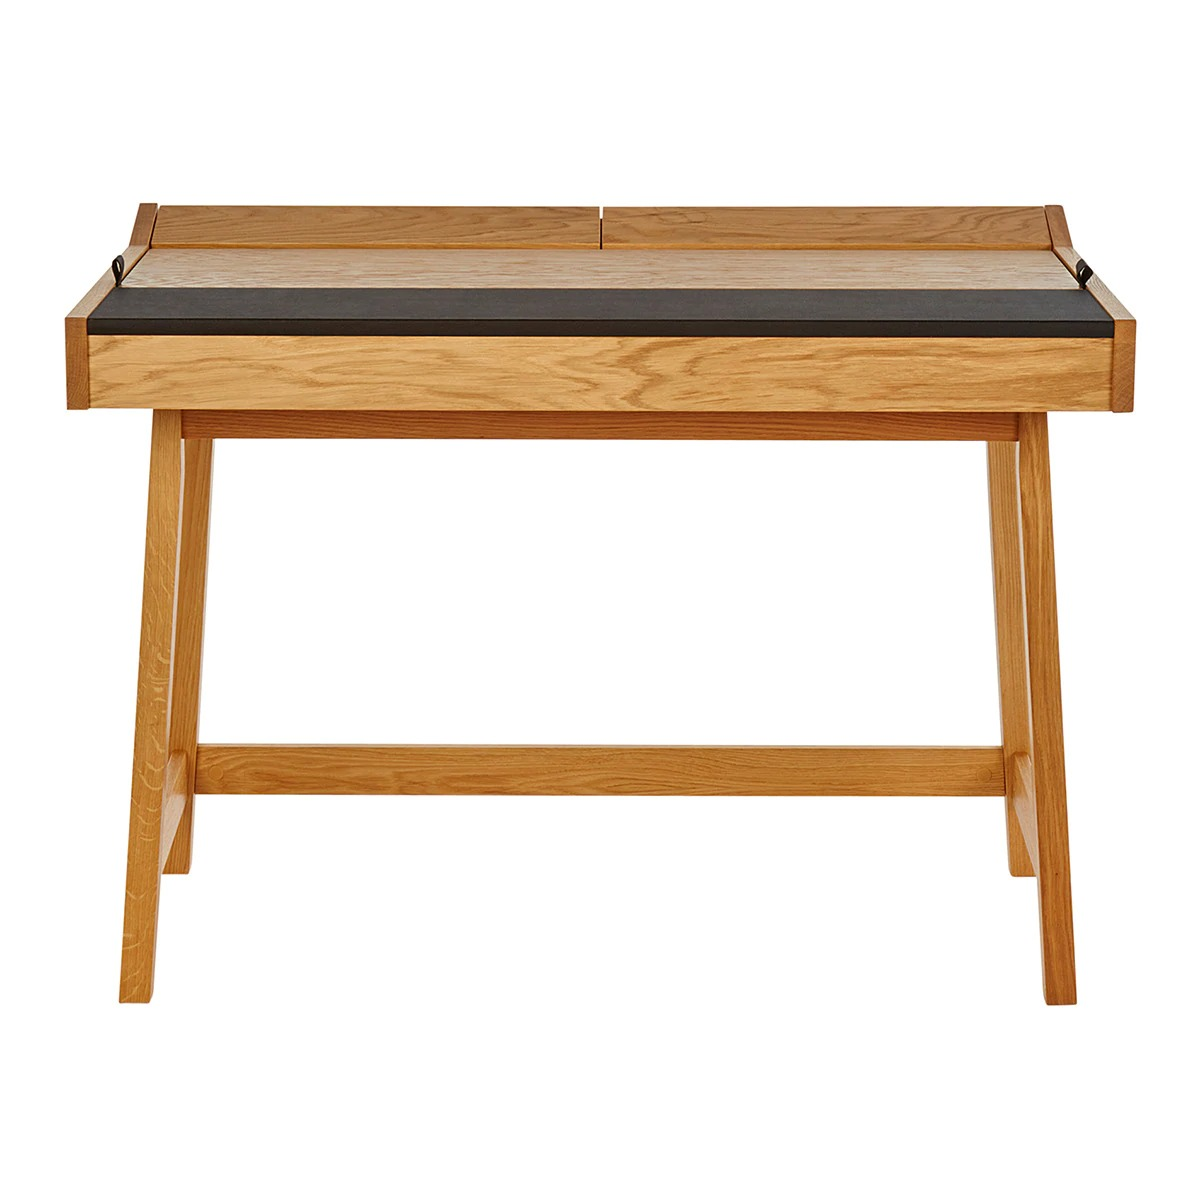 Escritorio de madera de estilo nórdico